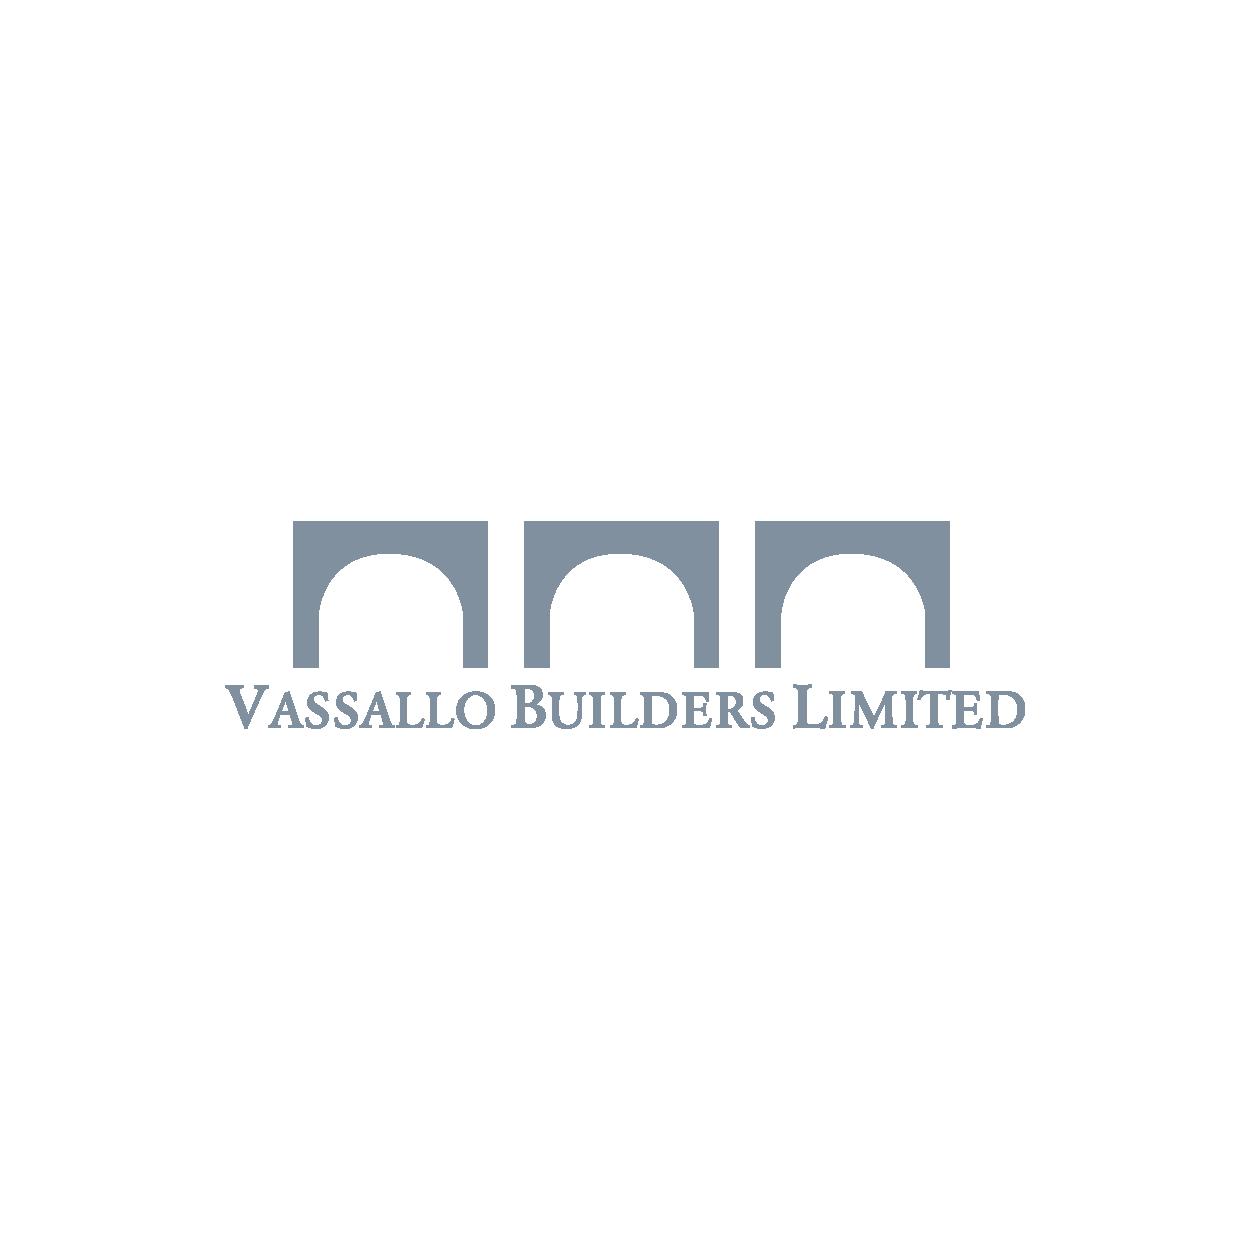 Vassallo Builders logo